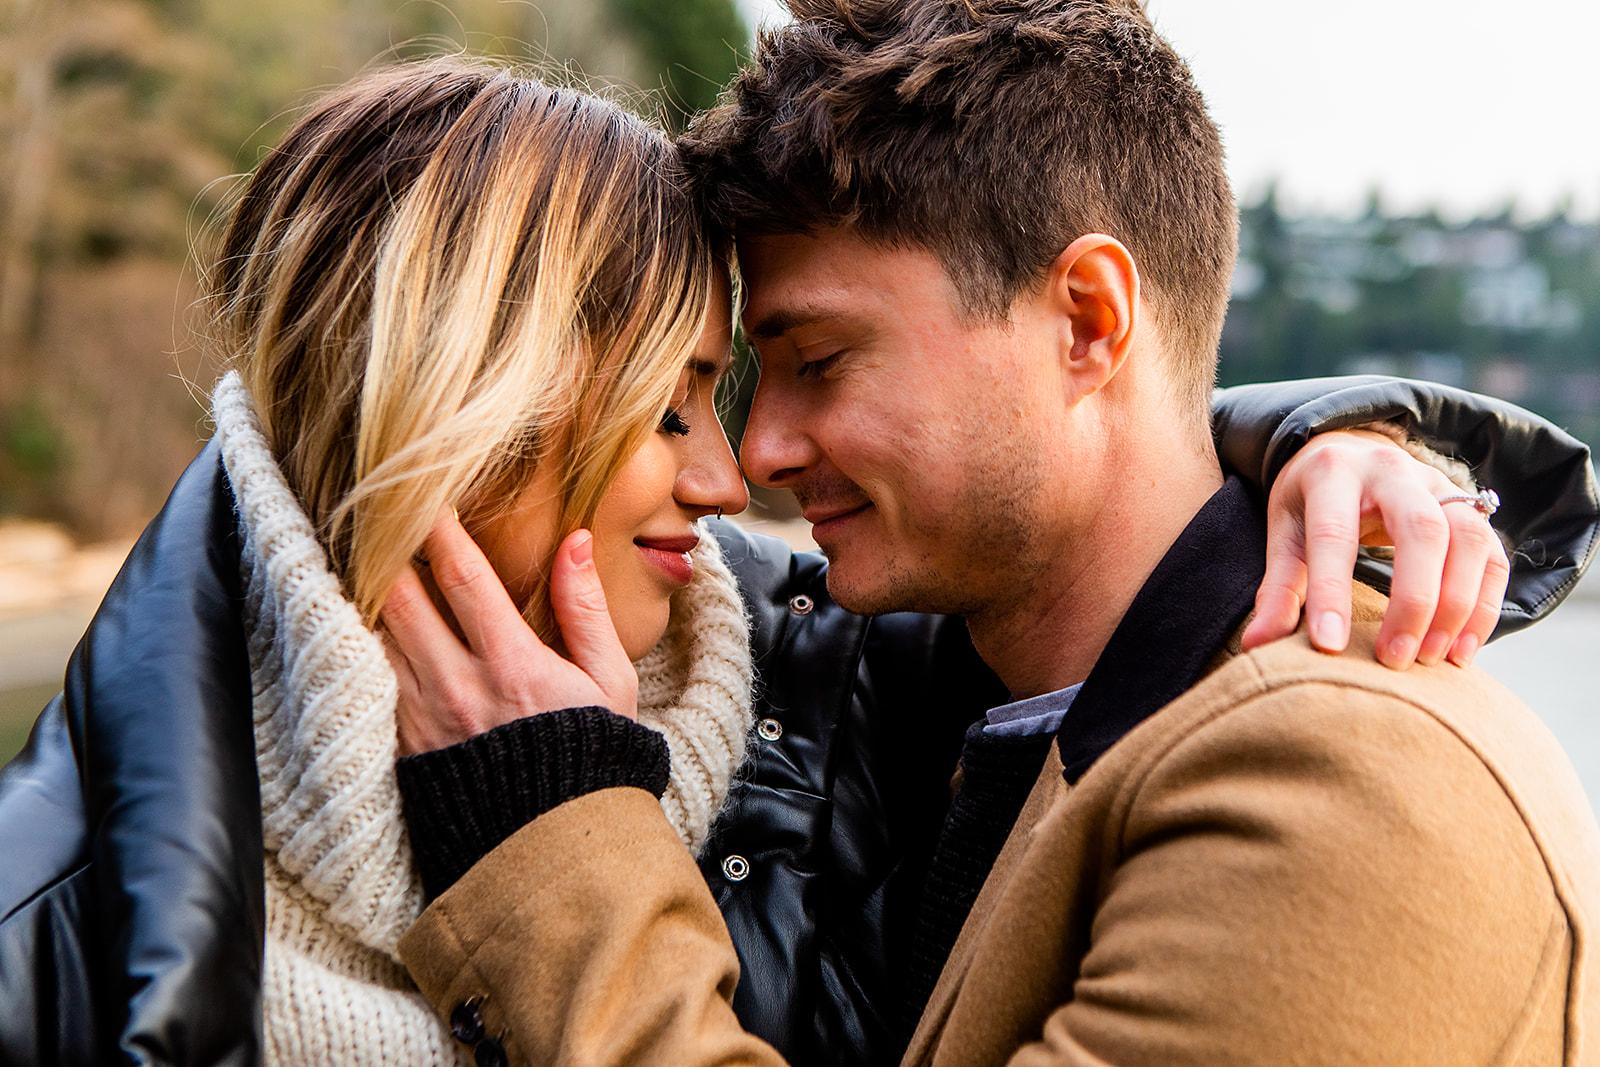 Glen holding Karissa's face in a close up romantic shot